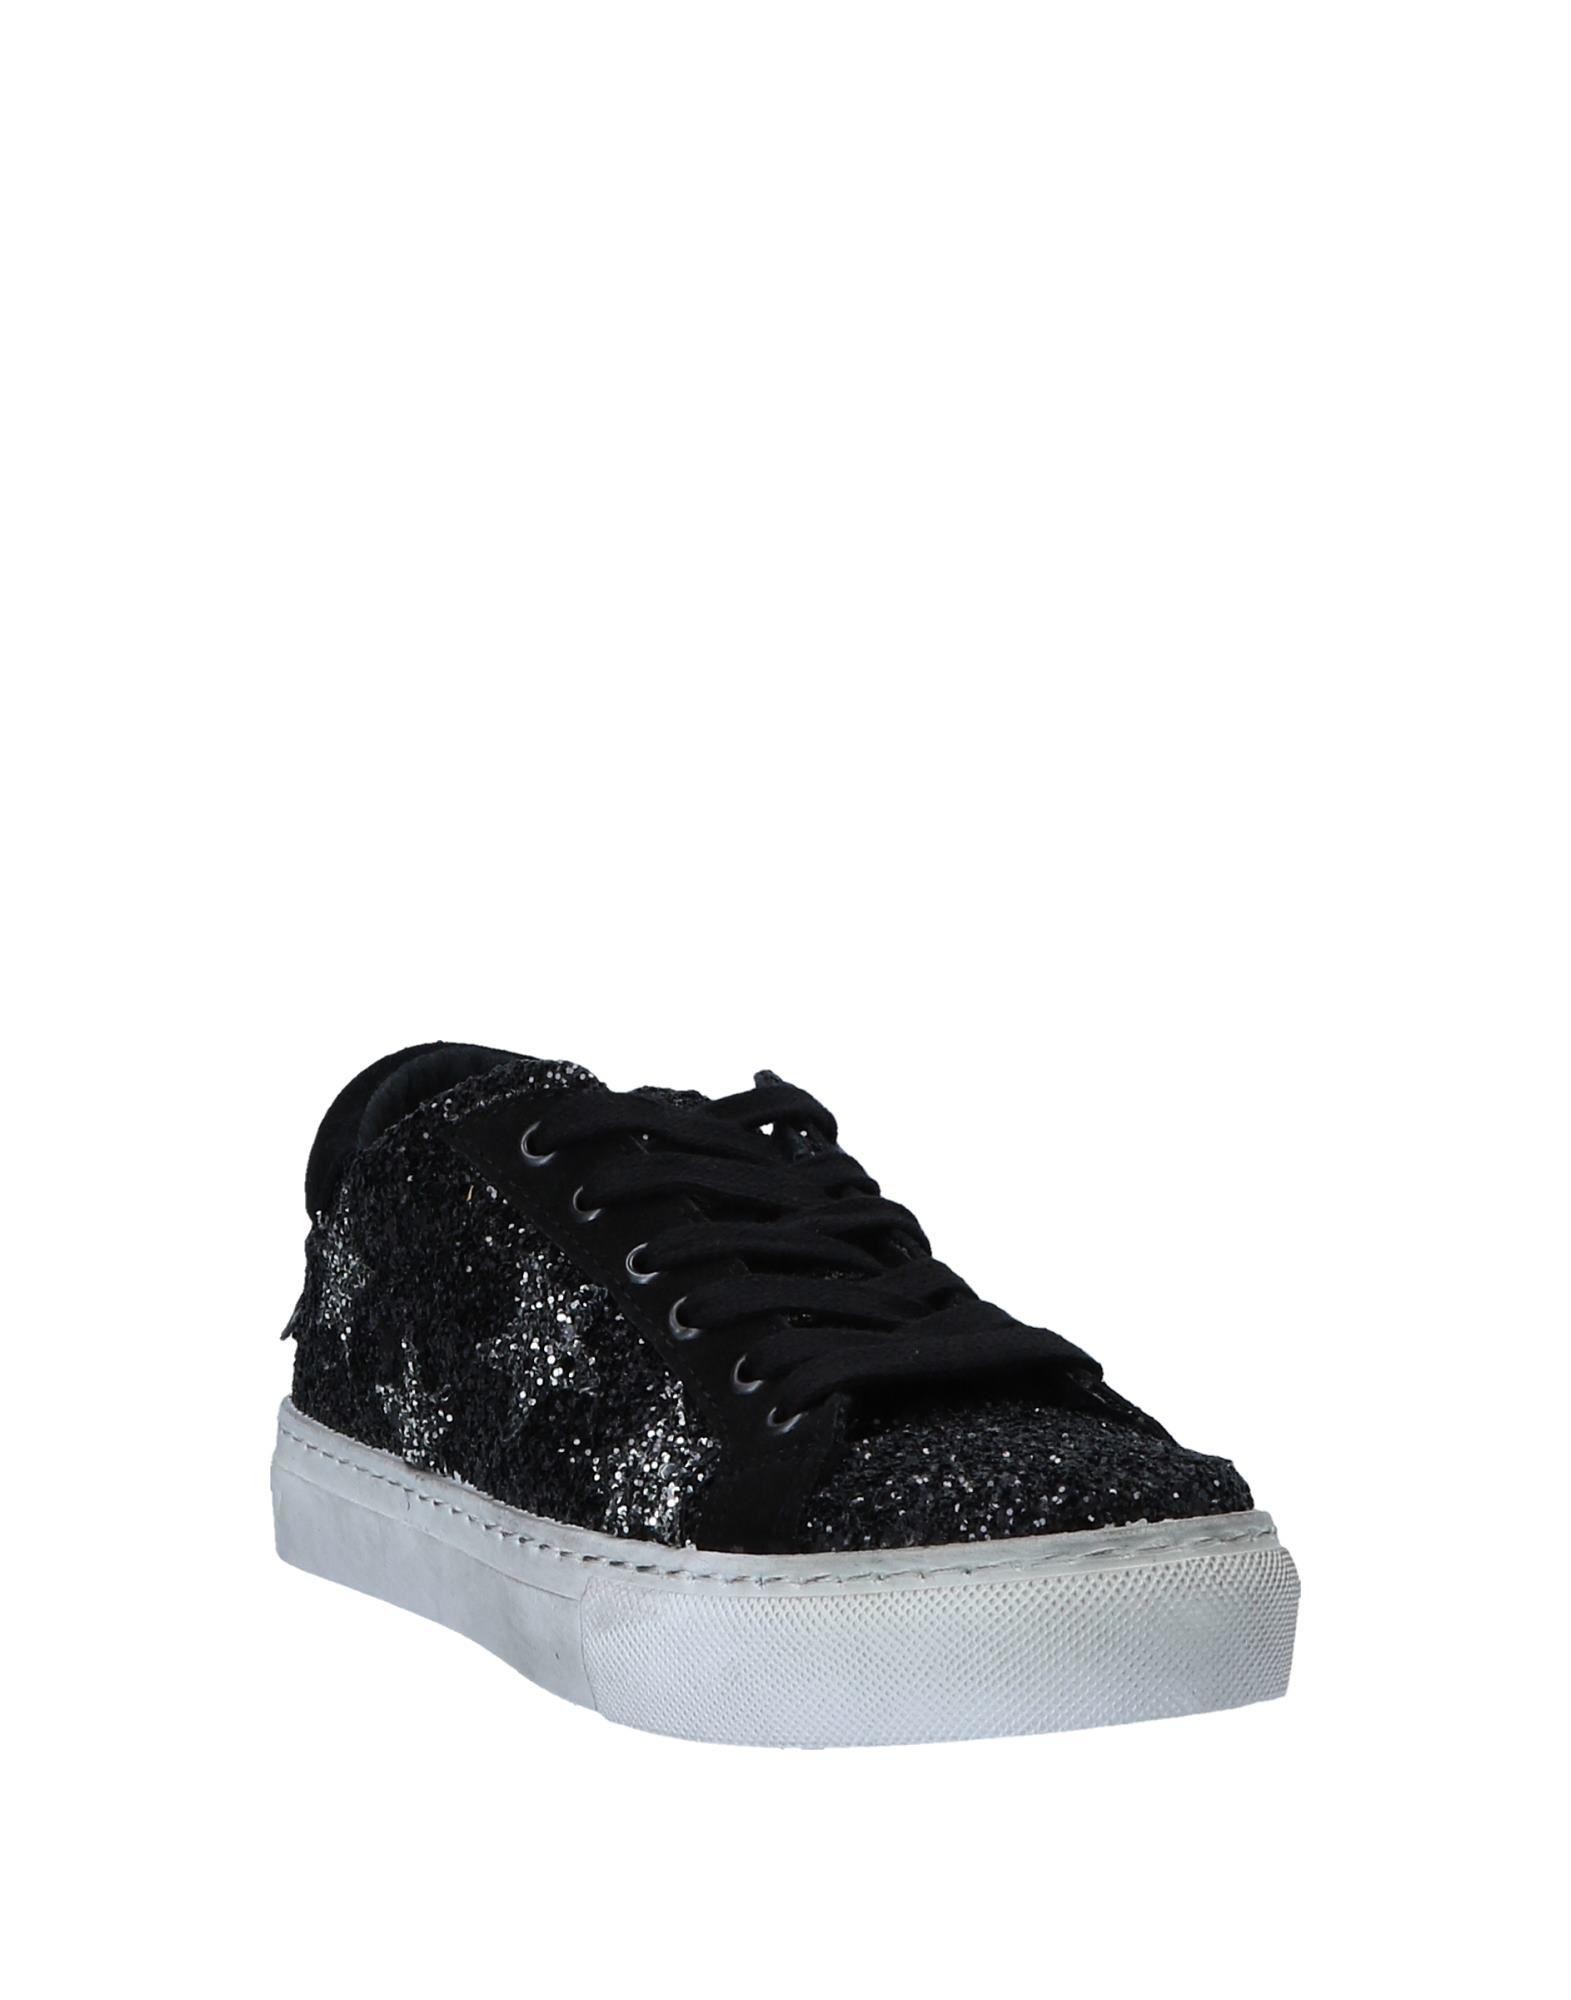 Ovye' 11557066OA By Cristina Lucchi Sneakers Damen  11557066OA Ovye' Gute Qualität beliebte Schuhe 8182c7